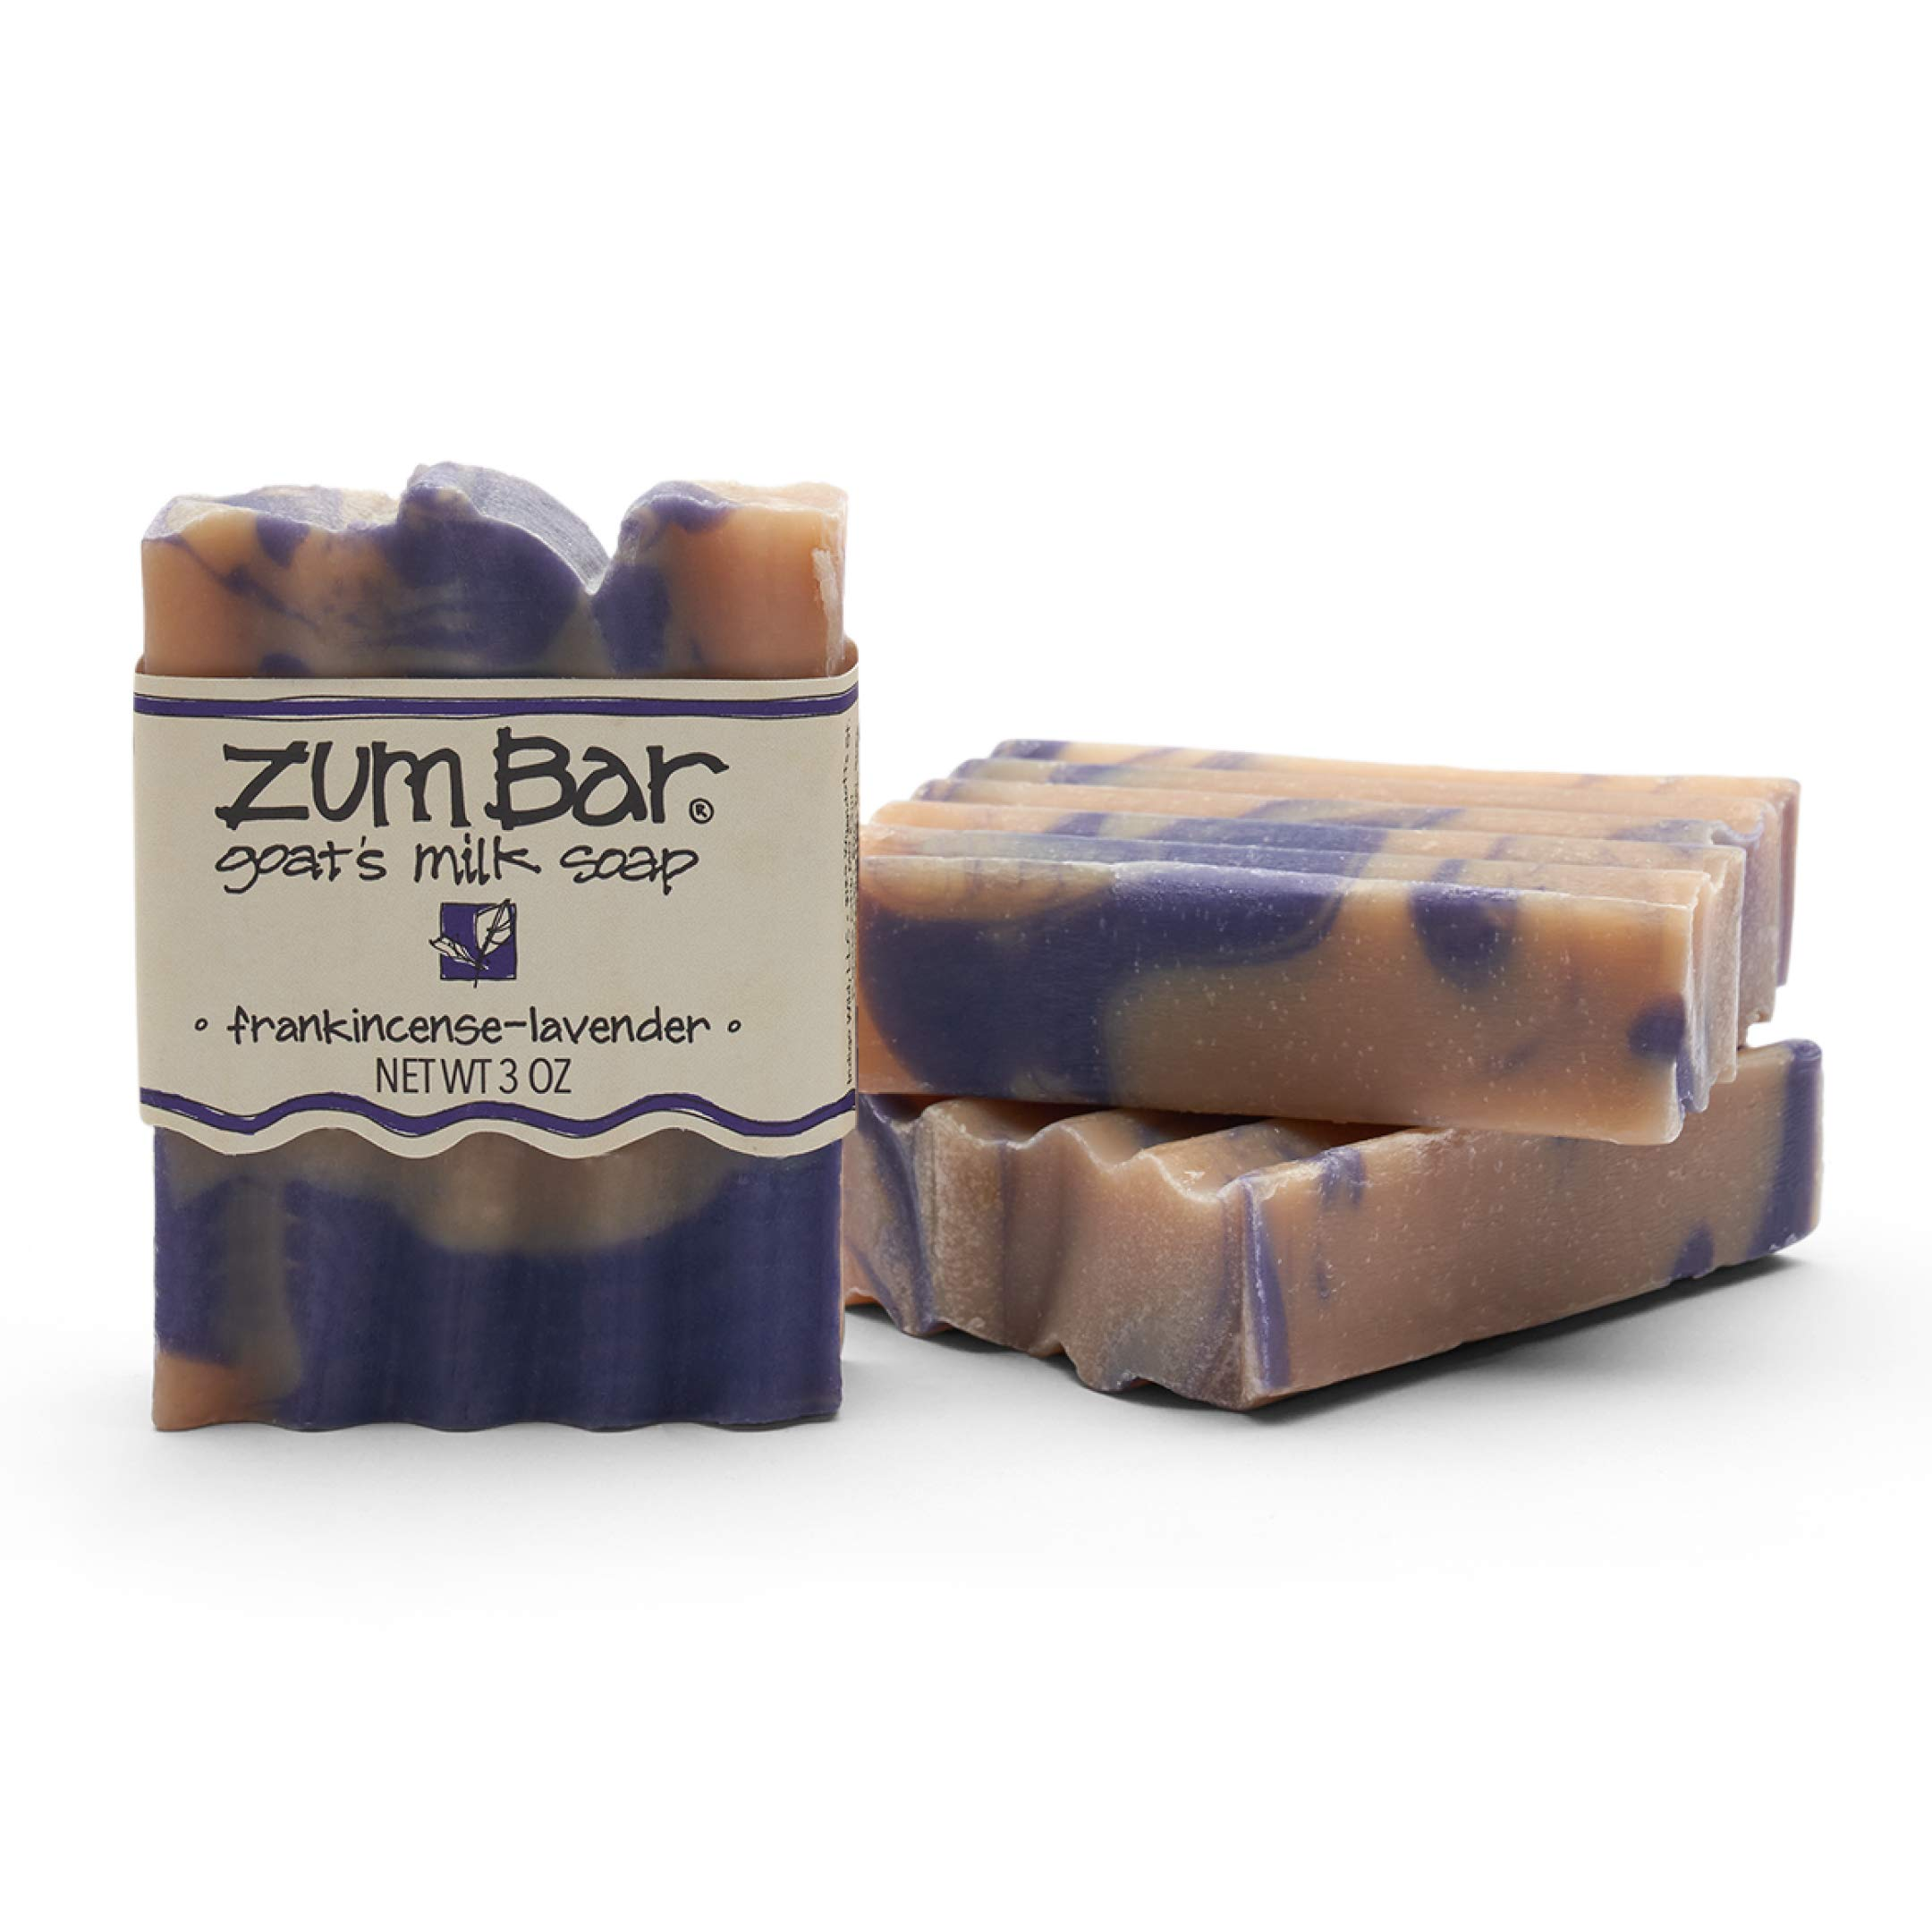 Zum Bar Goat's Milk Soap - Frankincense-Lavender - 3 oz (3 Pack)